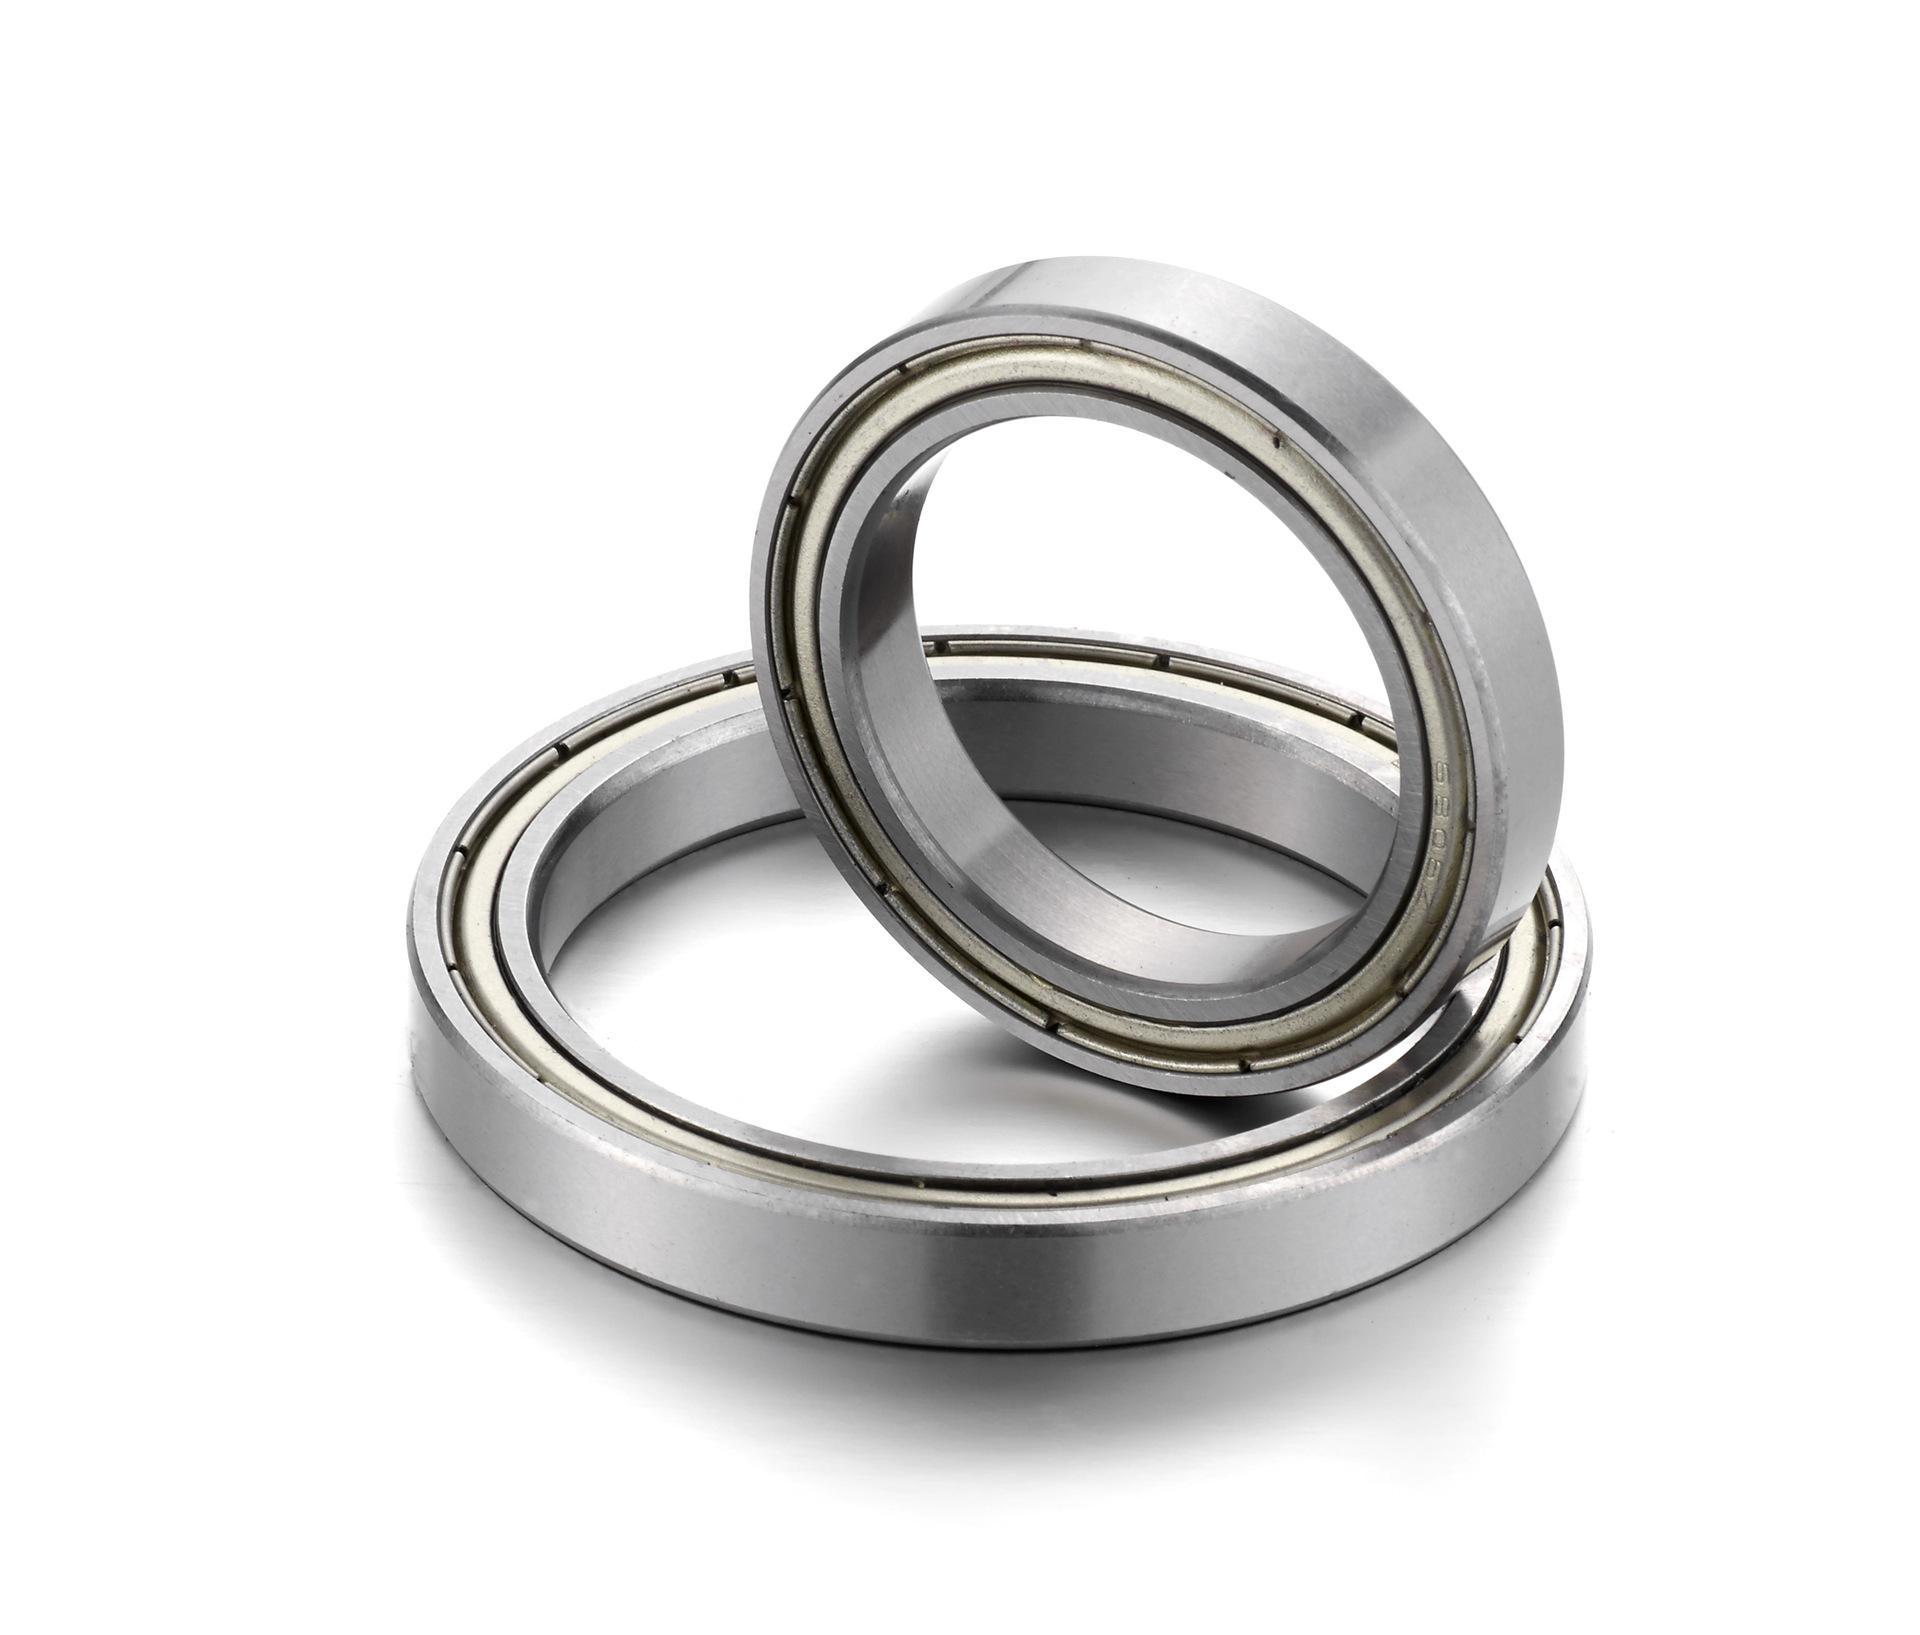 6824M ABEC-1  120x150x16mm Metric Thin Section Bearings brass cage 61824M 1pcs 71901 71901cd p4 7901 12x24x6 mochu thin walled miniature angular contact bearings speed spindle bearings cnc abec 7